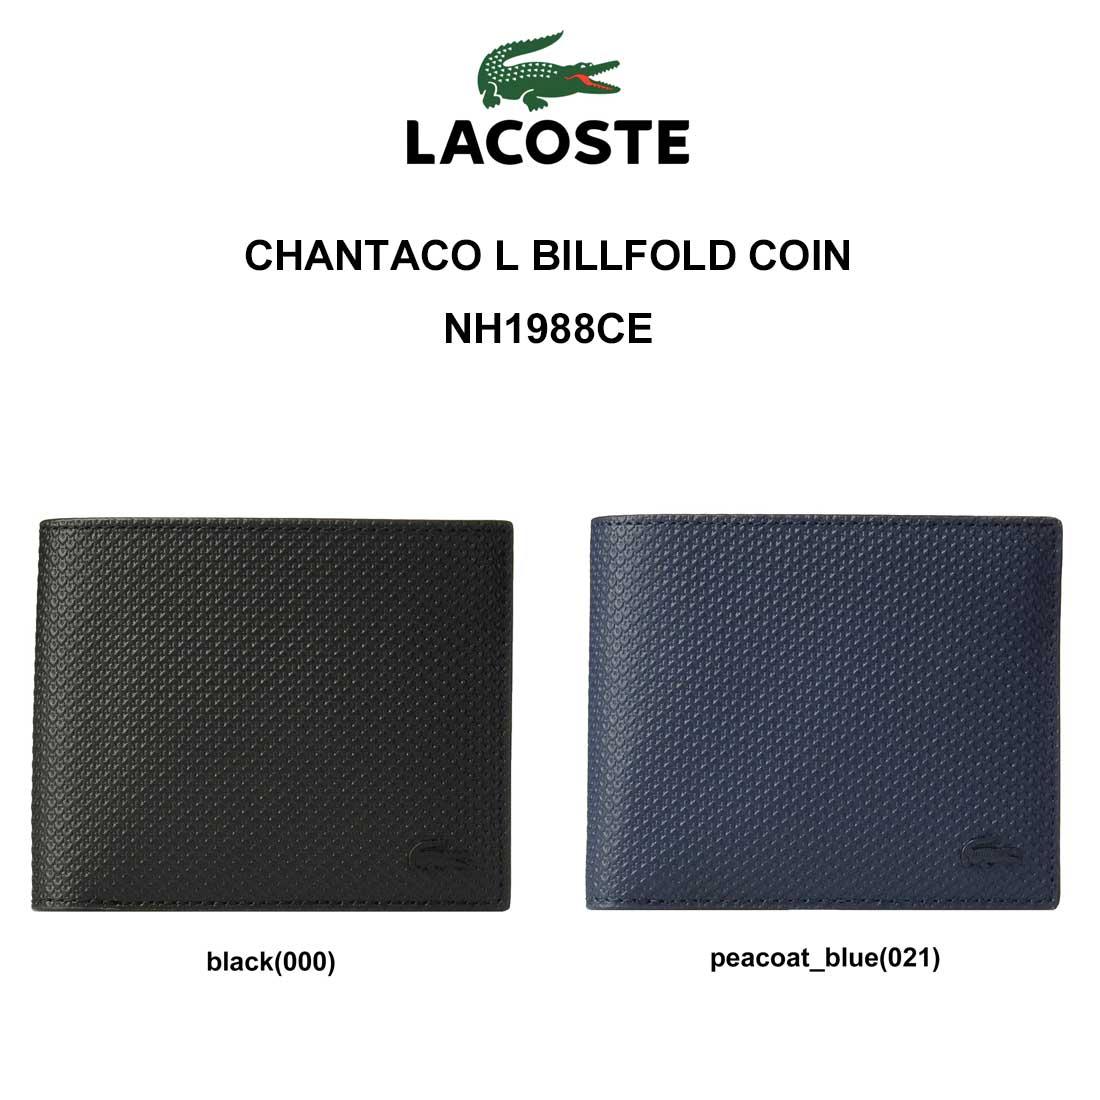 LACOSTE(ラコステ)二つ折り財布 小銭入れ付き 本革 メンズ CHANTACO L BILLFOLD COIN NH1988CE